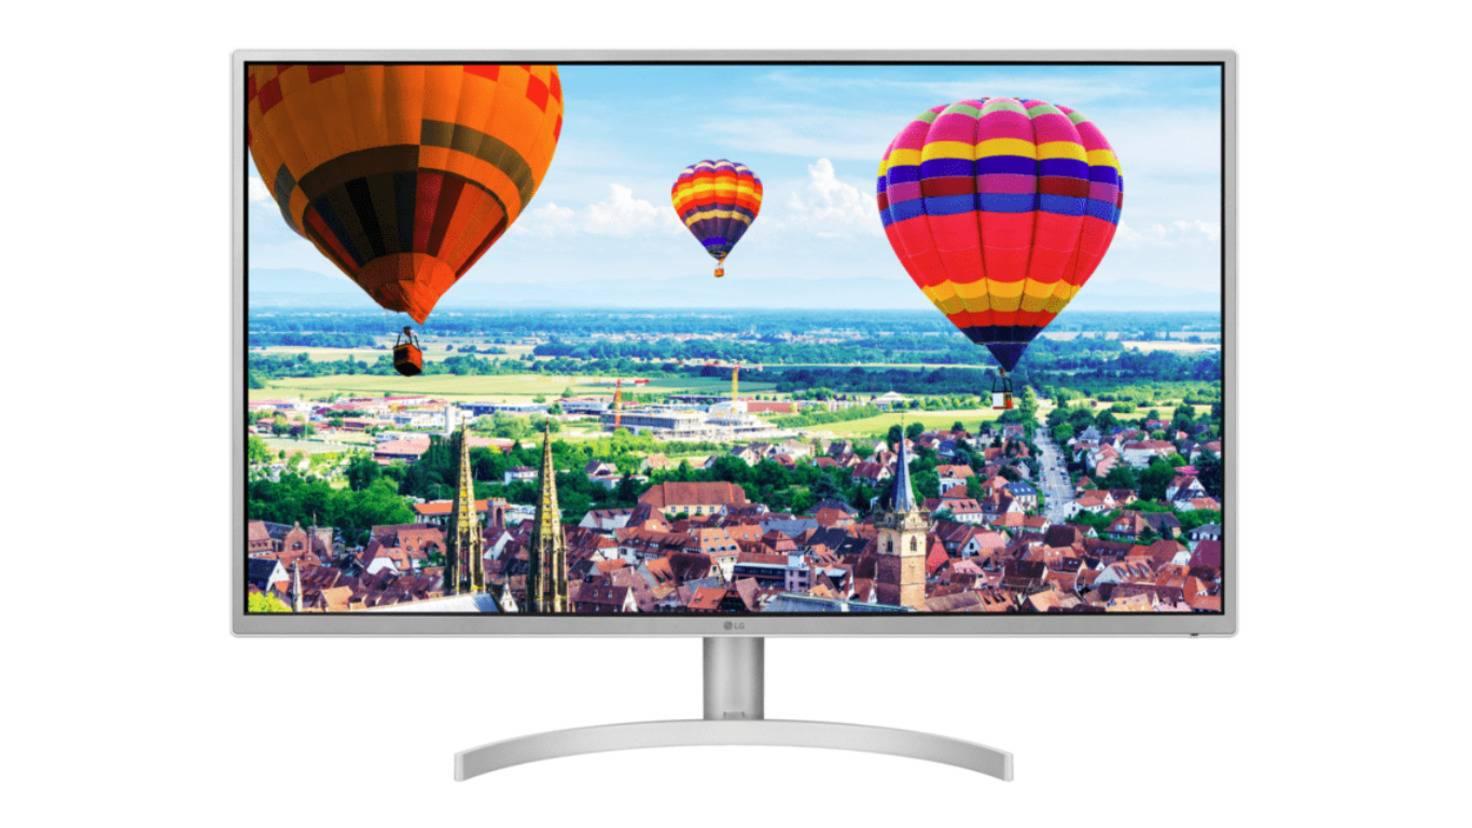 lg-32qk500-w-monitor